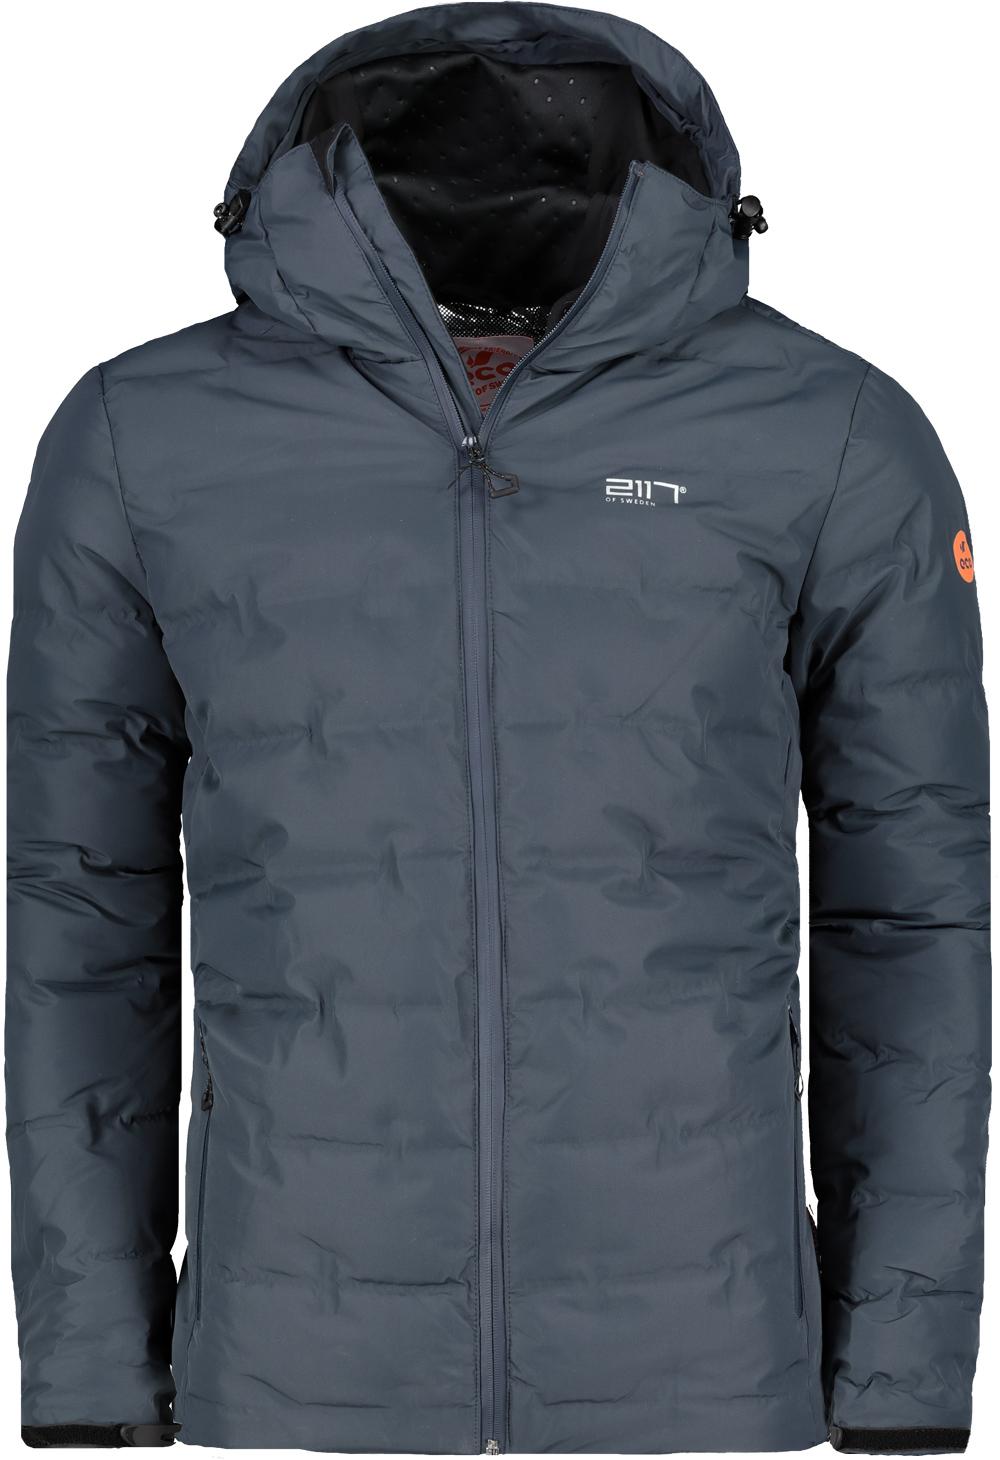 Bunda ECO lyžiarská pánska 2117 MON